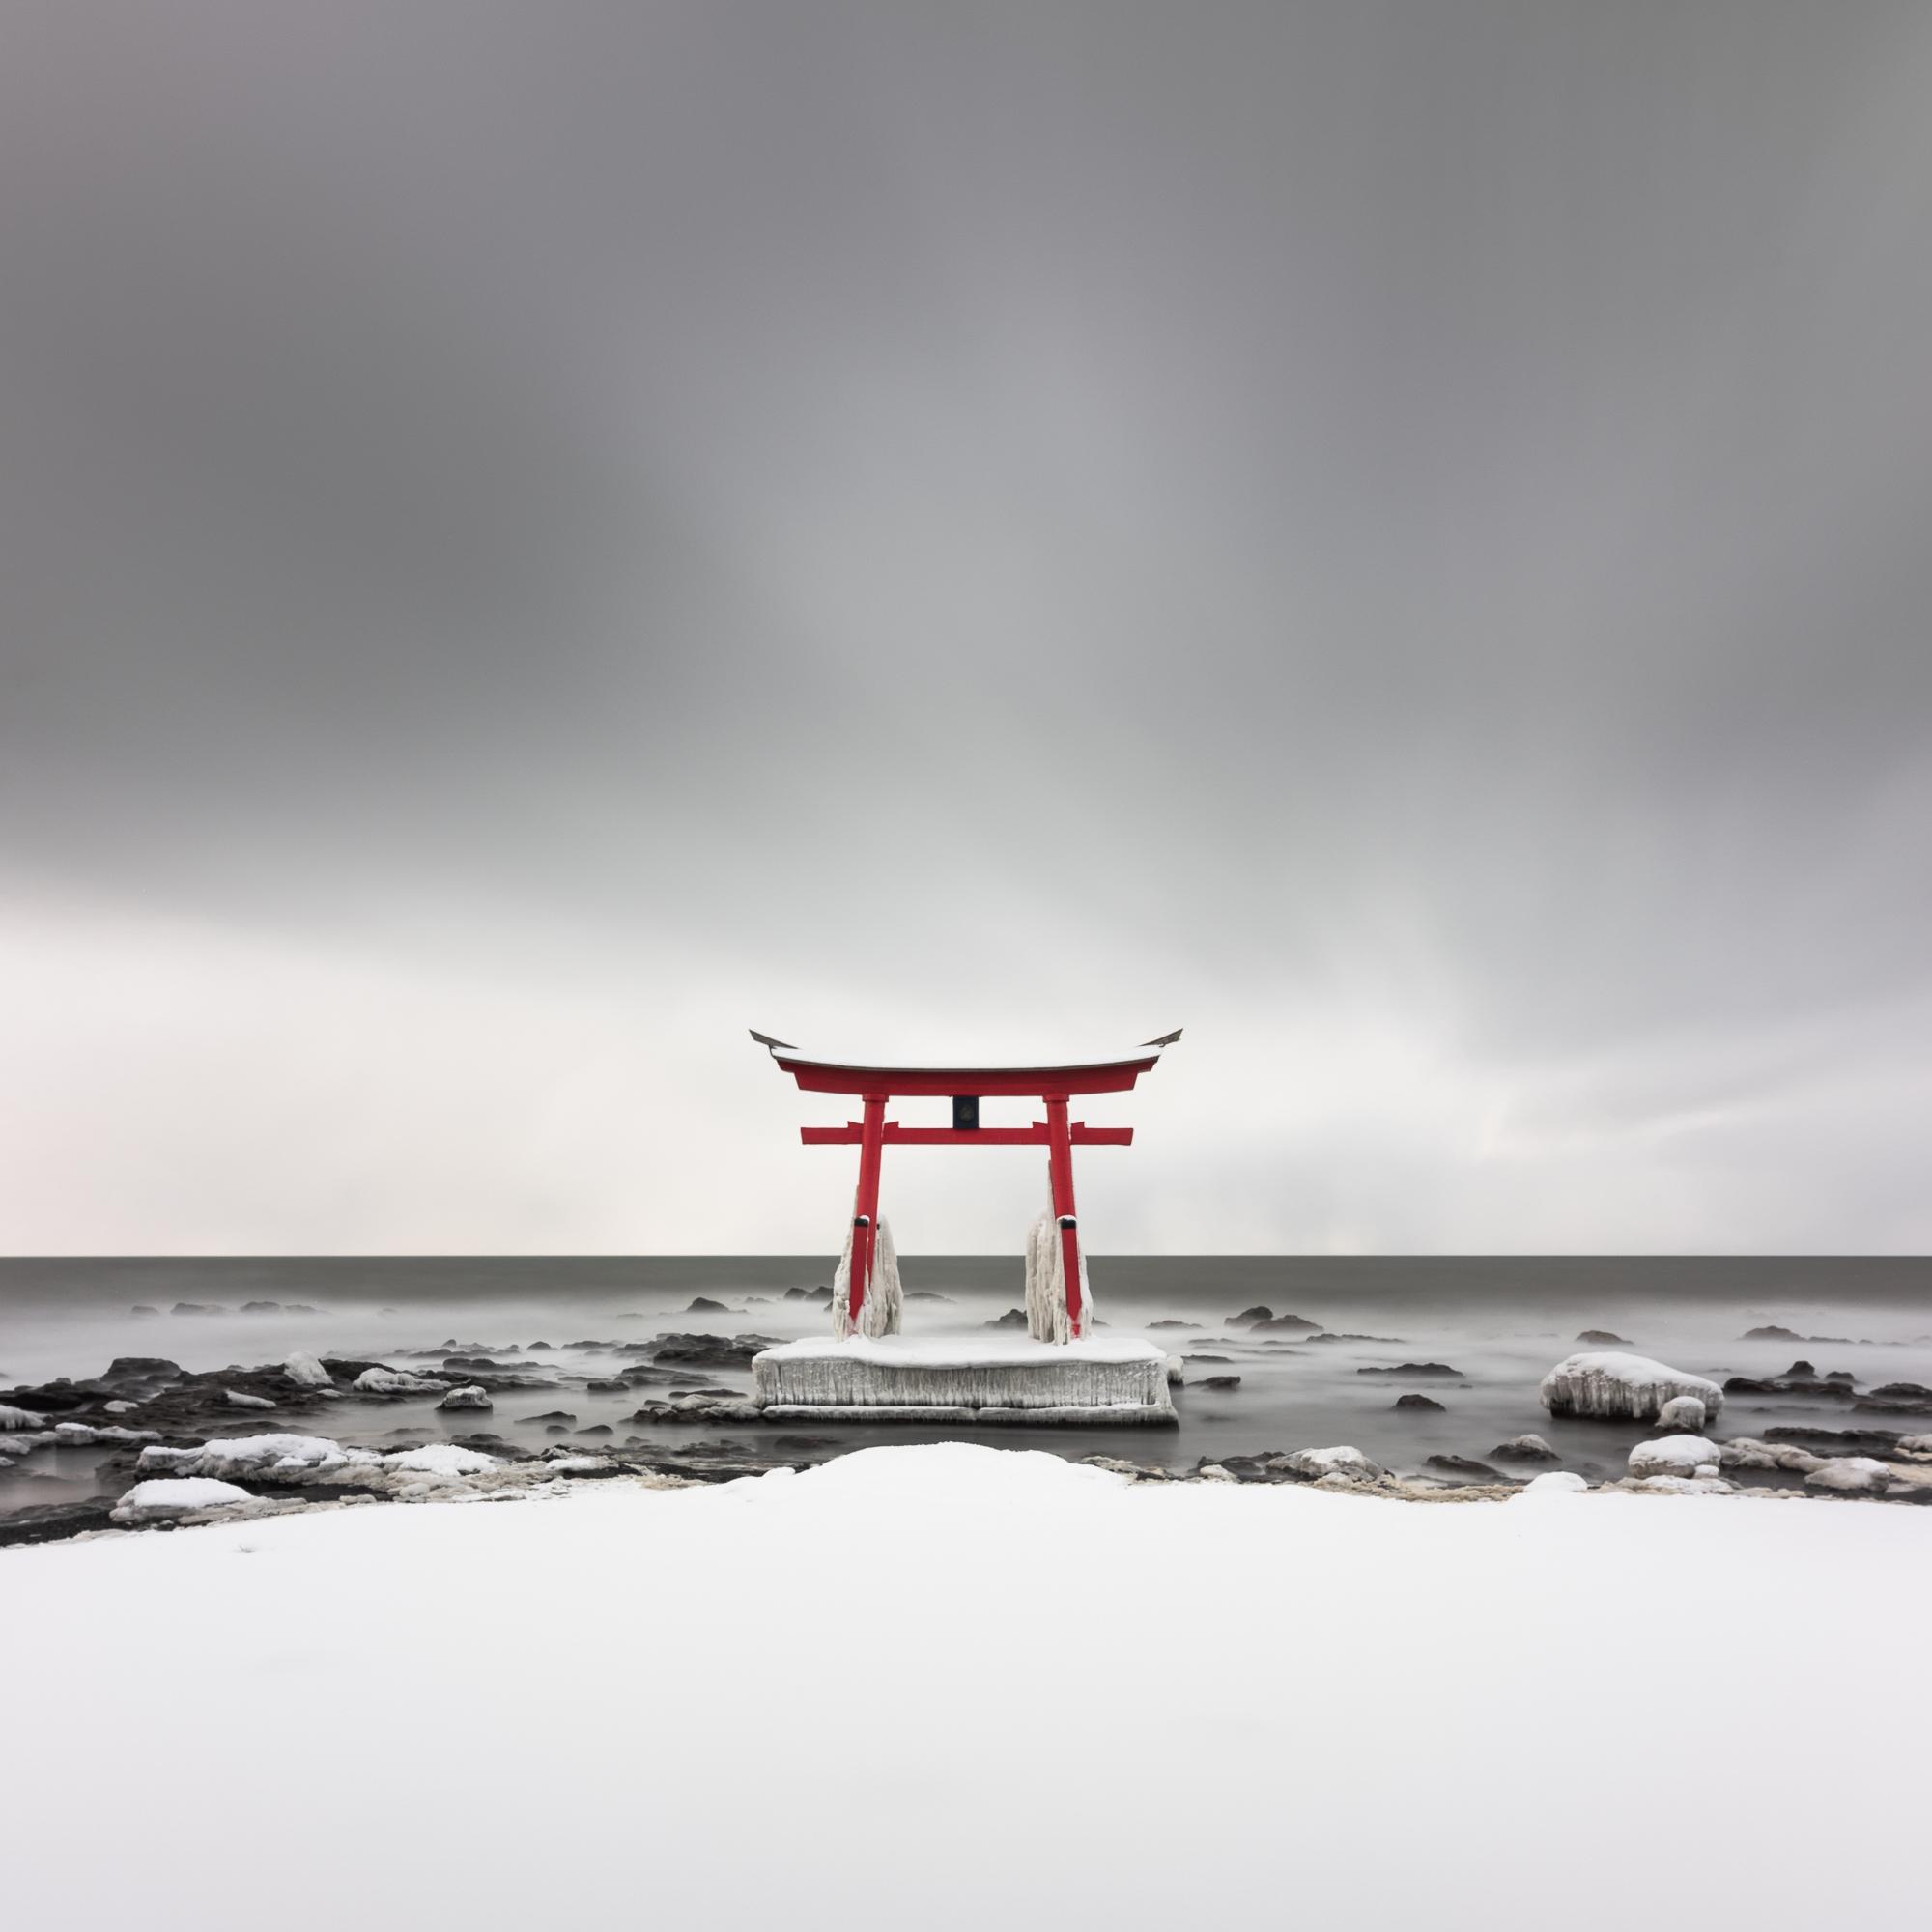 Minimalism in Hokkaido - Minimalist photography in winter in Hokkaido, Japan.